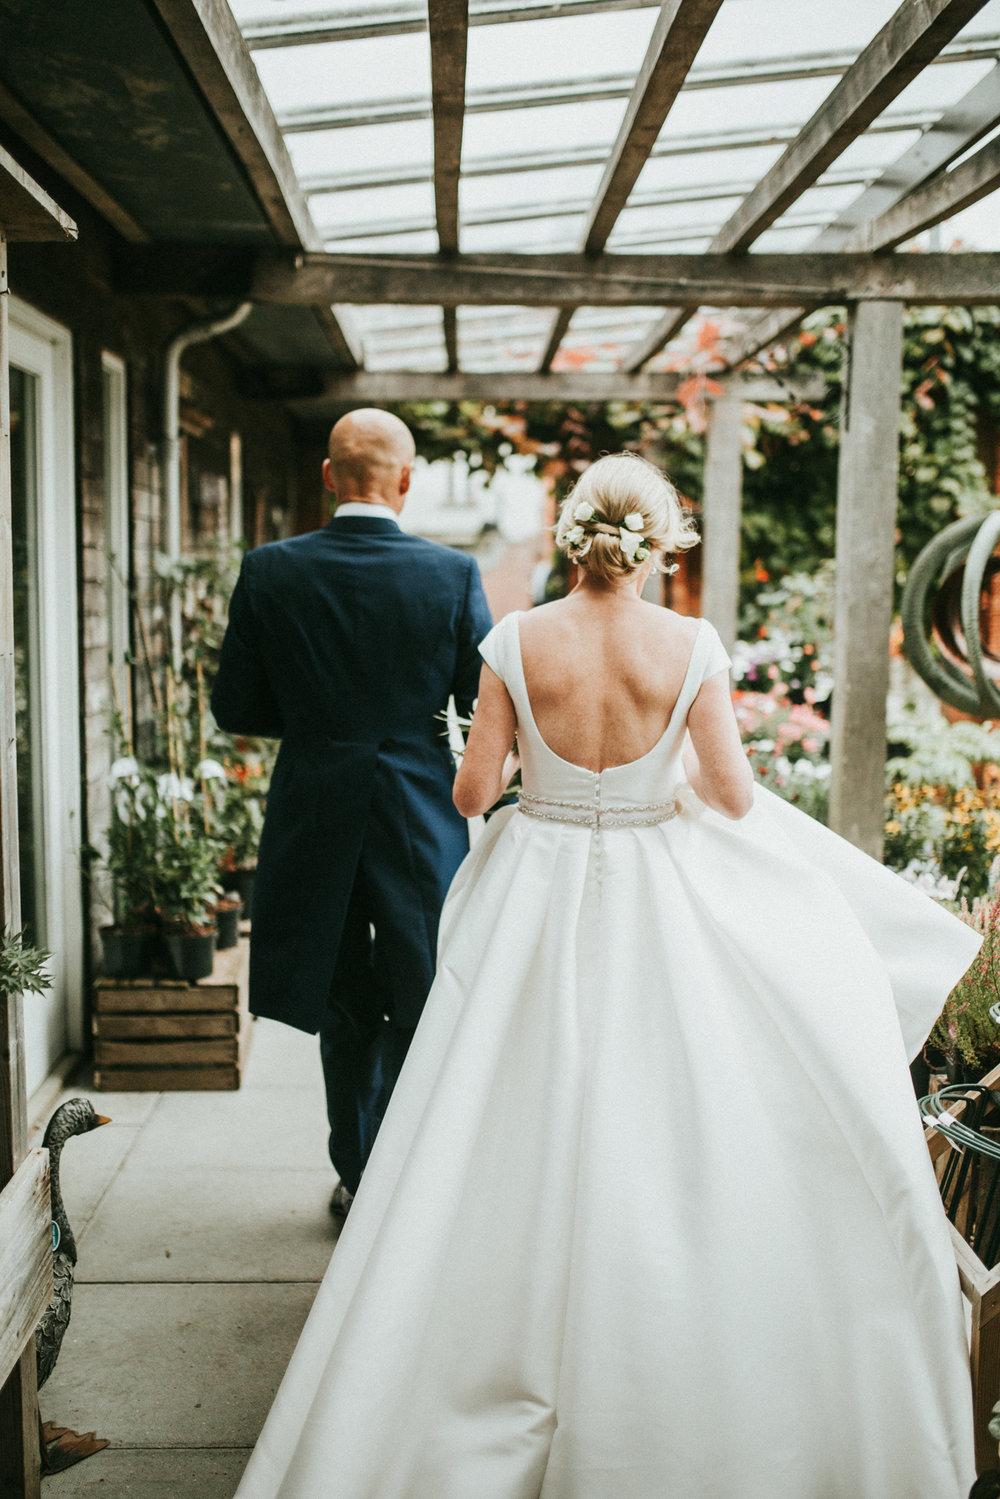 Adam-Rhiannon-Wedding-Photography-The-Italian-Villa-Poole-Bournemouth-Adventure-Beach-Darina-Stoda-59.jpg